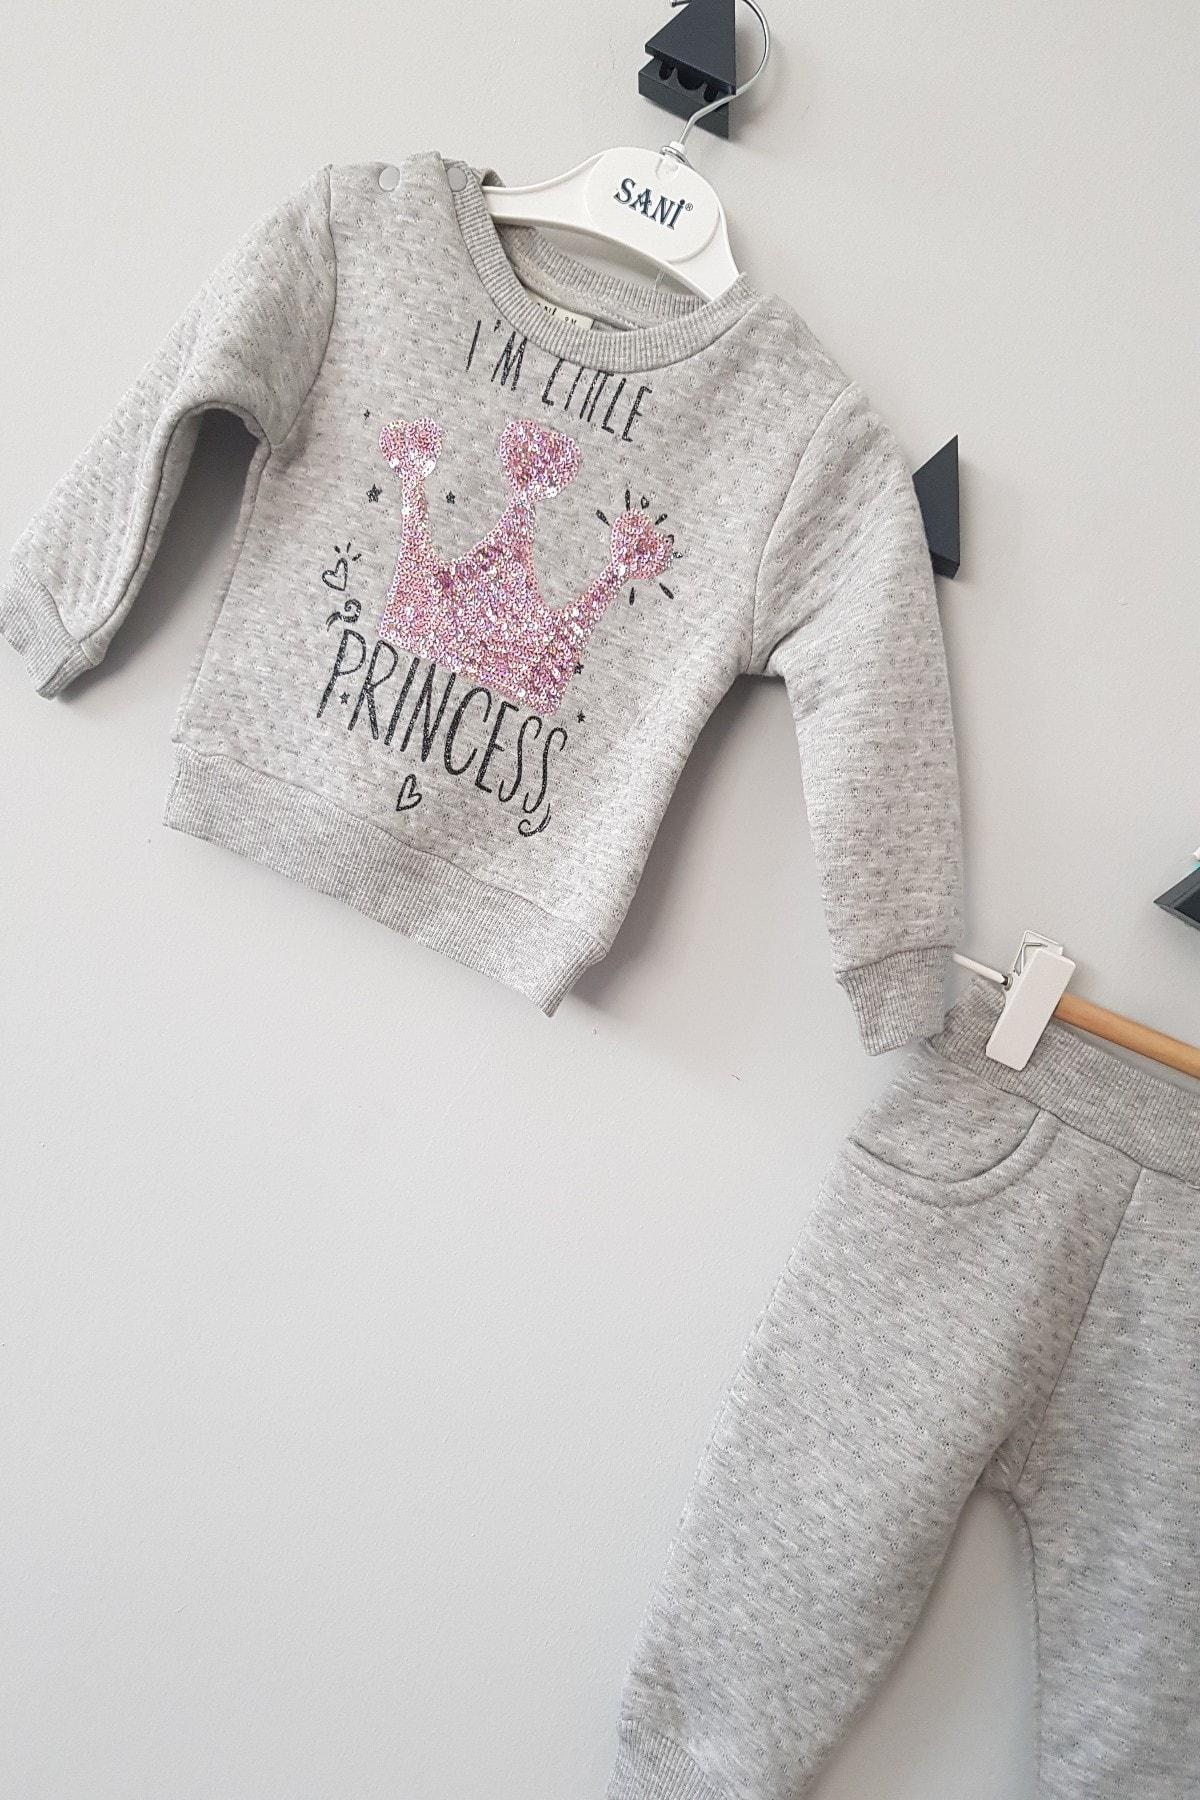 Sani 9/24 Kız Bebek Pamuklu Simli Gri Princess Baskı Ikili Takım 1